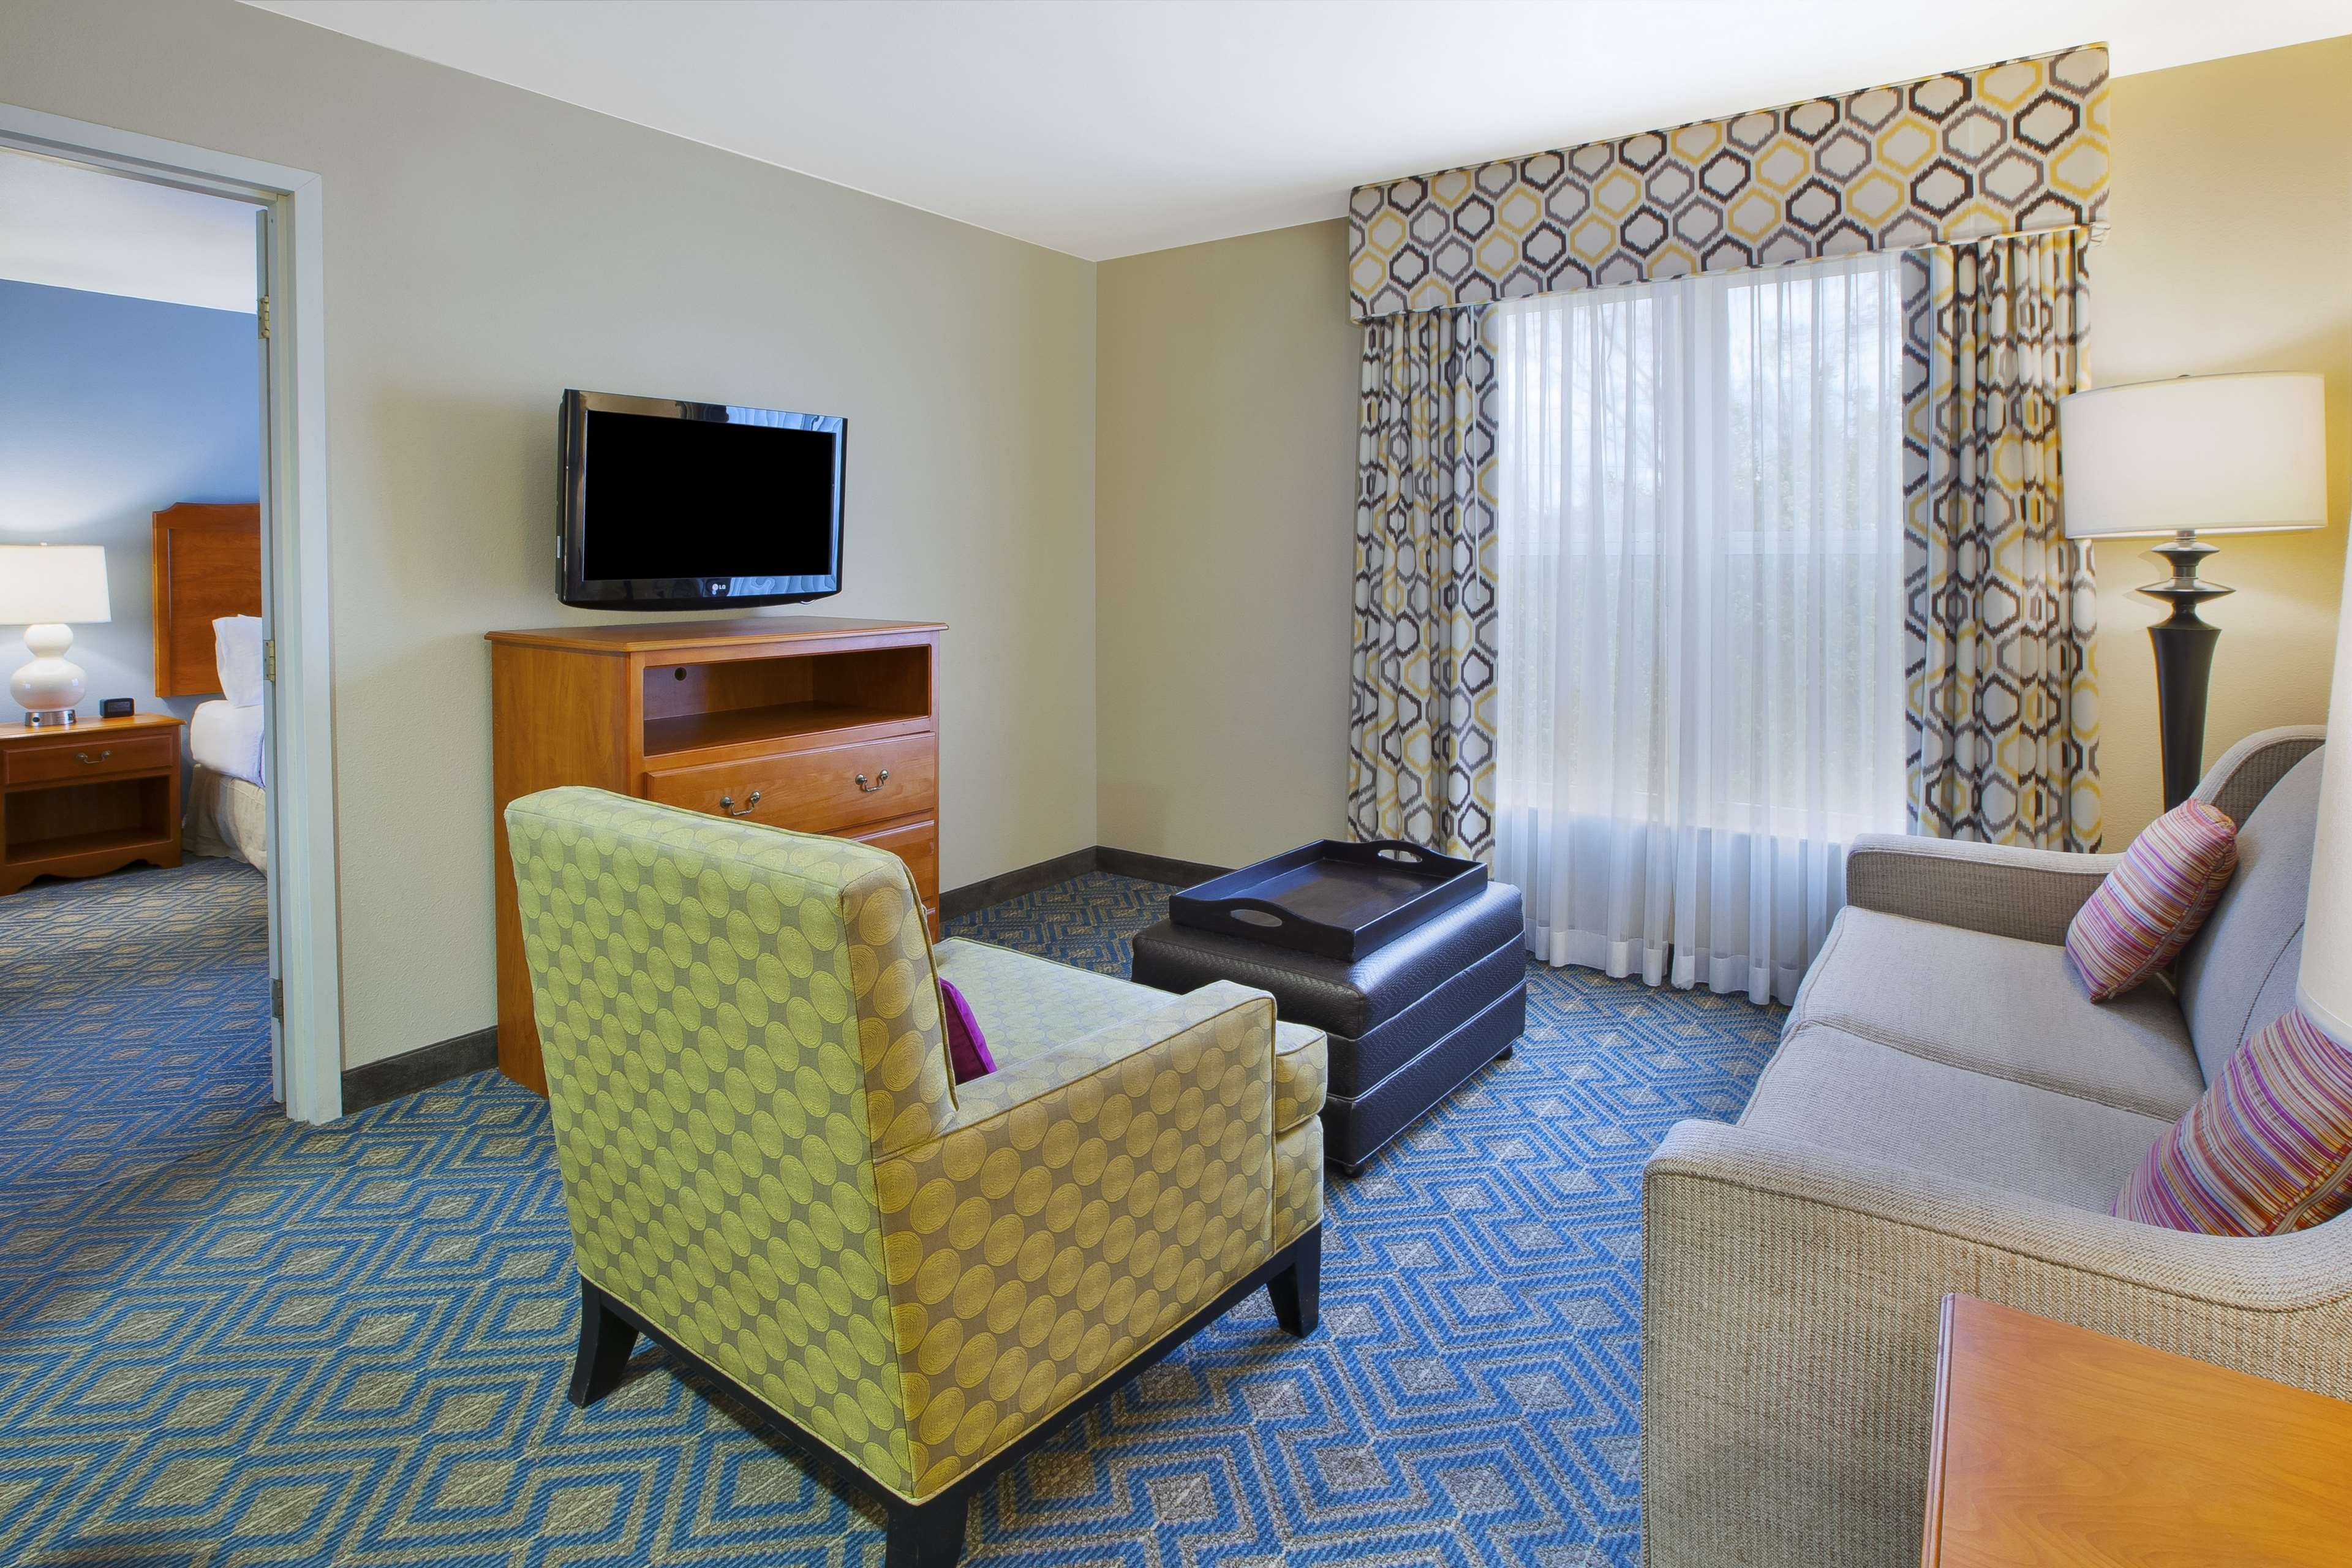 Homewood Suites by Hilton Philadelphia/Mt. Laurel image 15